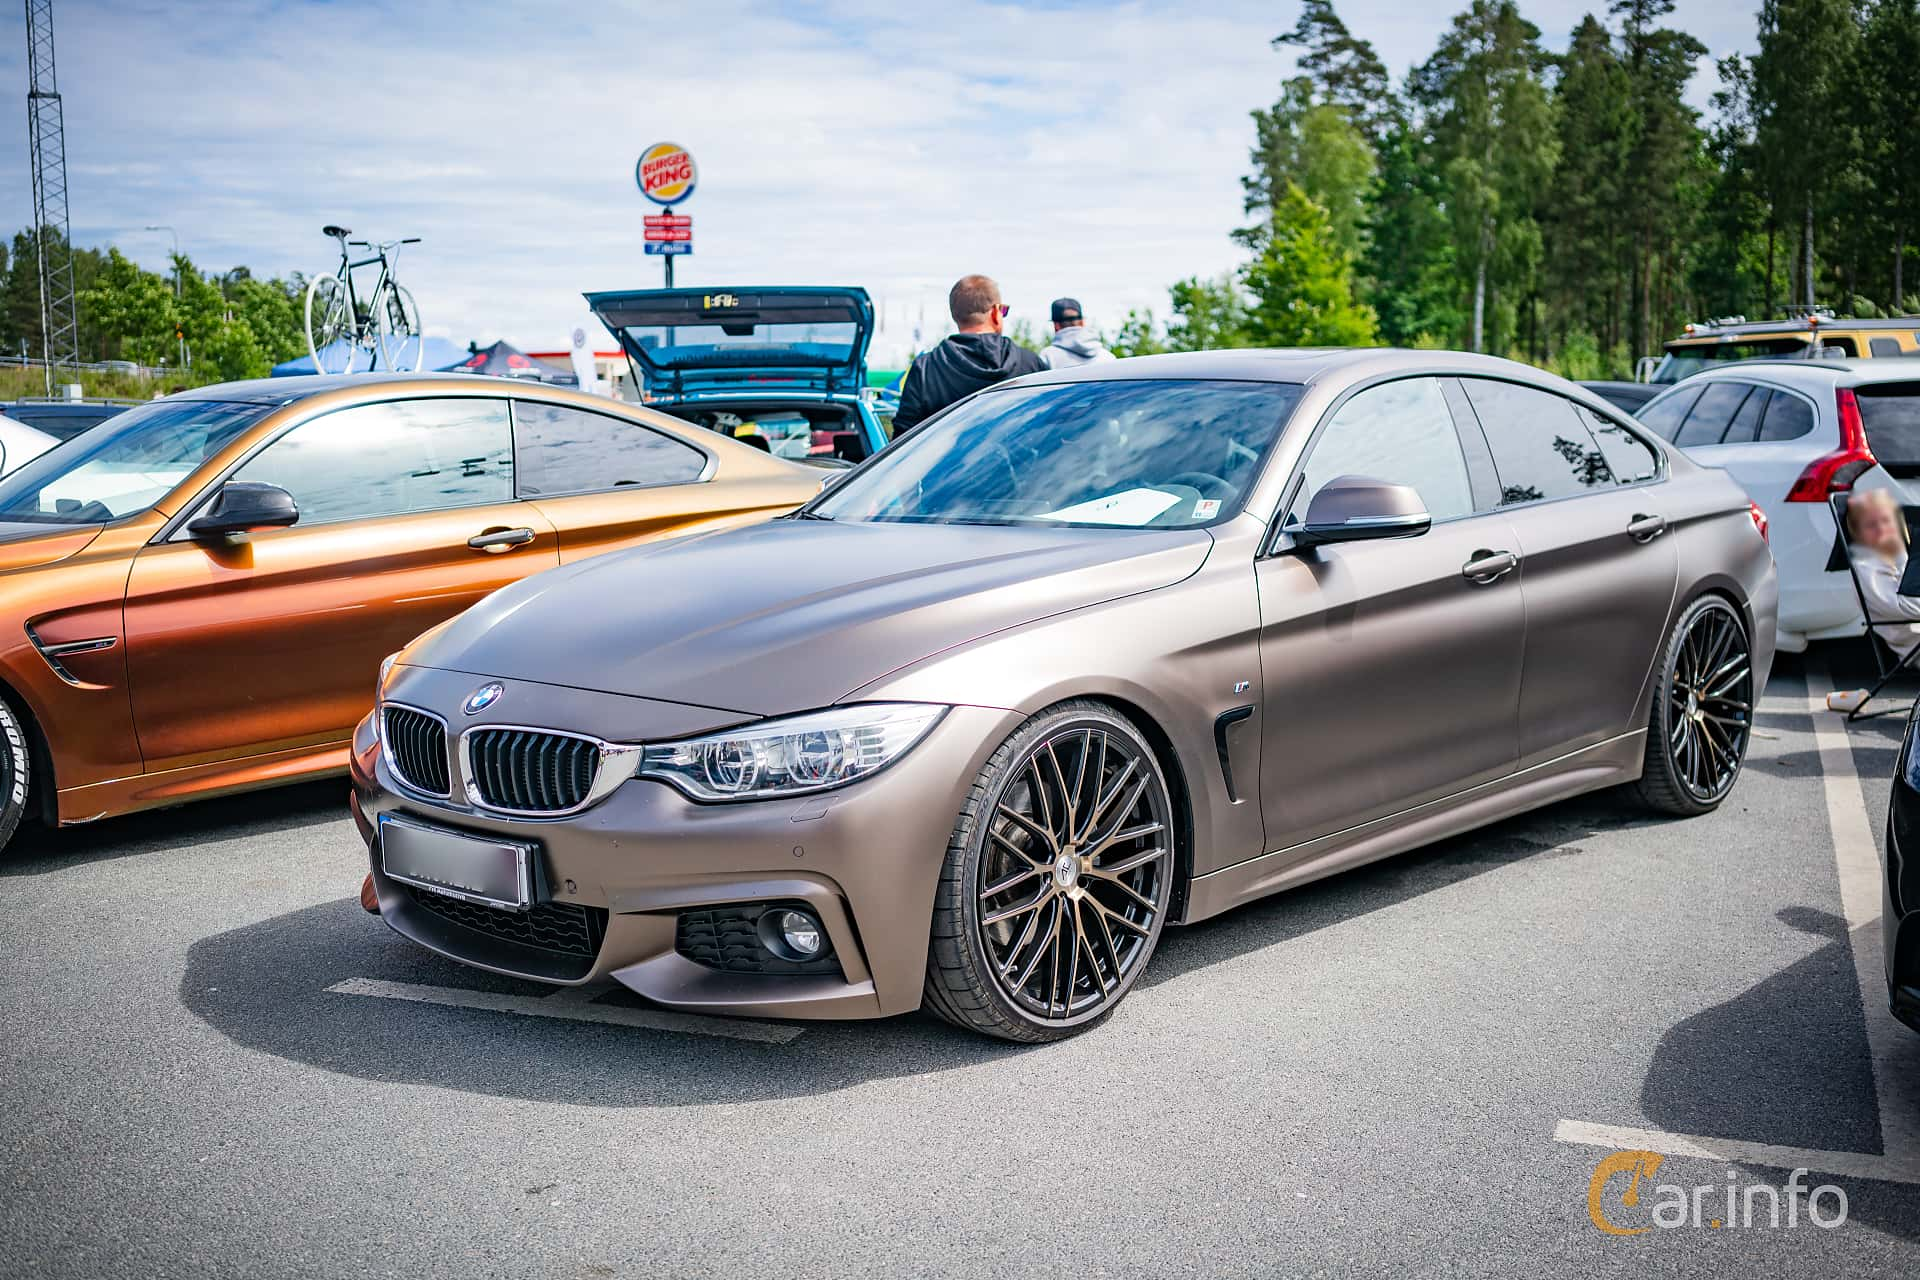 Front/Side  of BMW 3 Series Sedan 2012 at Biltema Meet, Växjö 2018